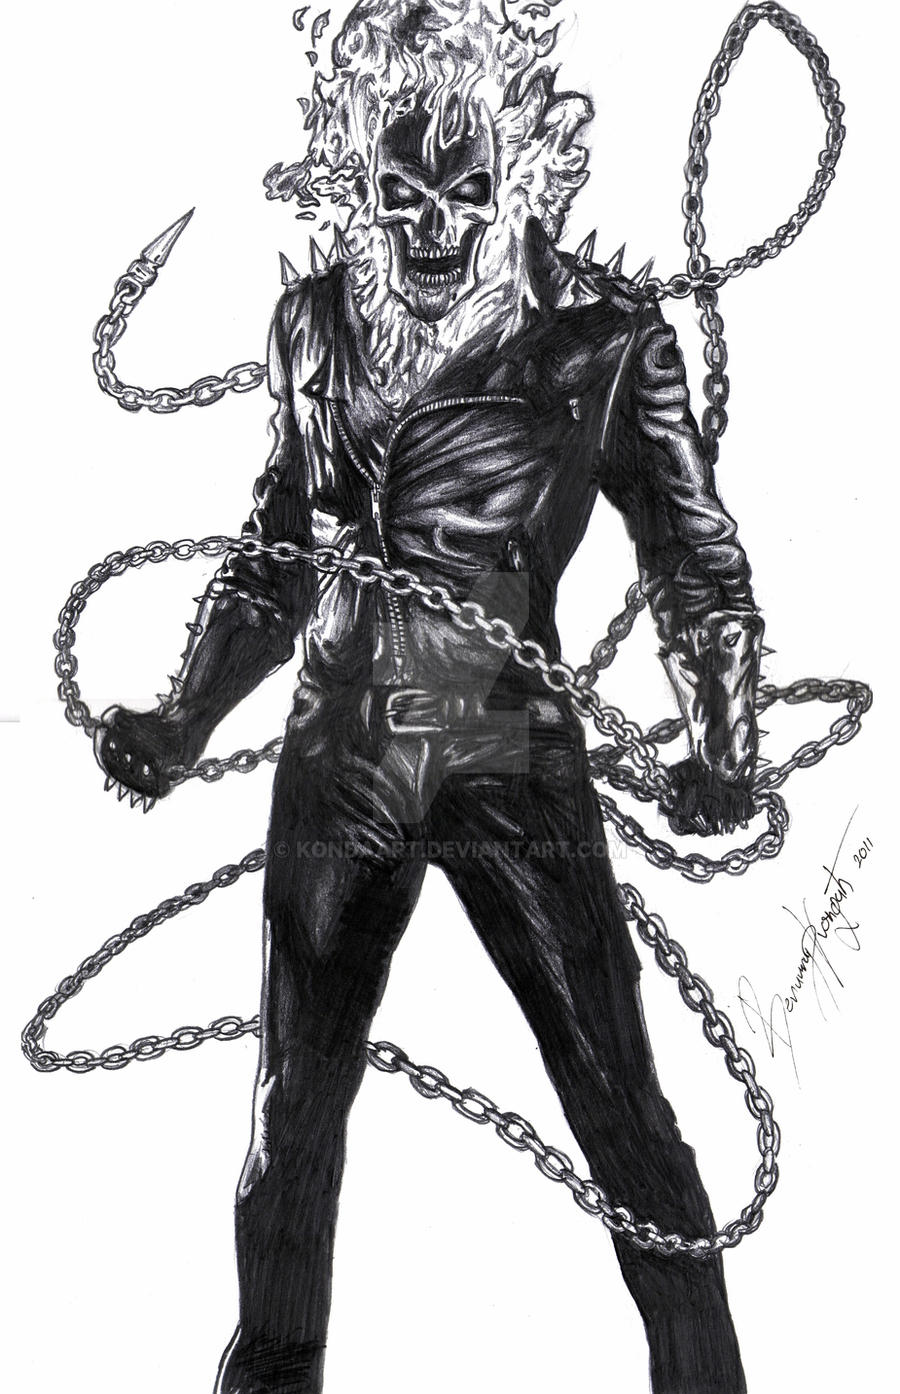 Cowboy Ghost Rider Drawings   www.pixshark.com - Images ...